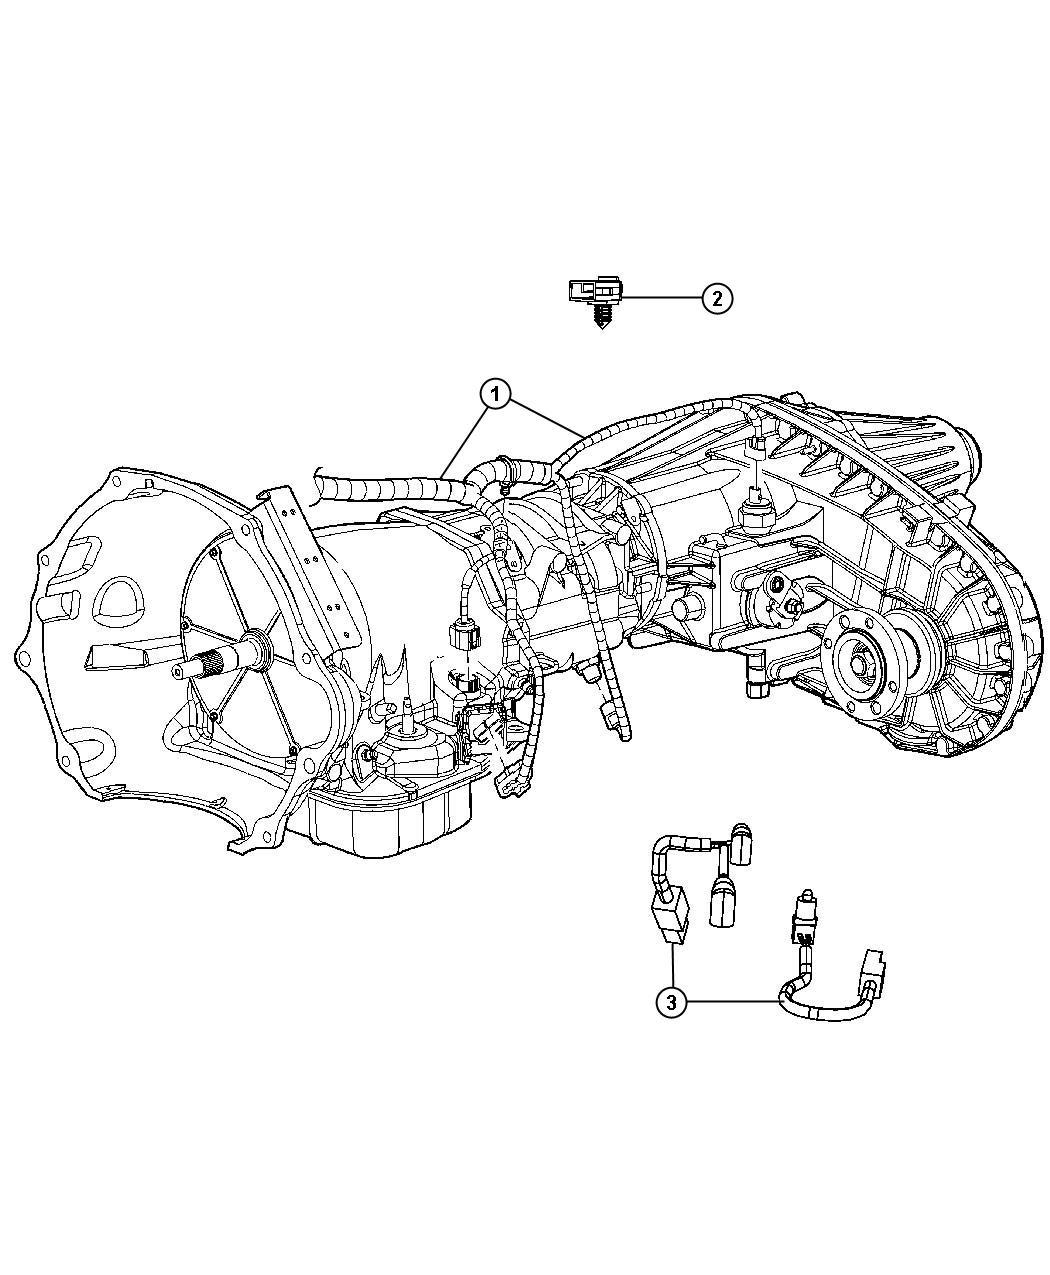 Dodge Ram 4500 Wiring. Transmission. [elec shift-on-the